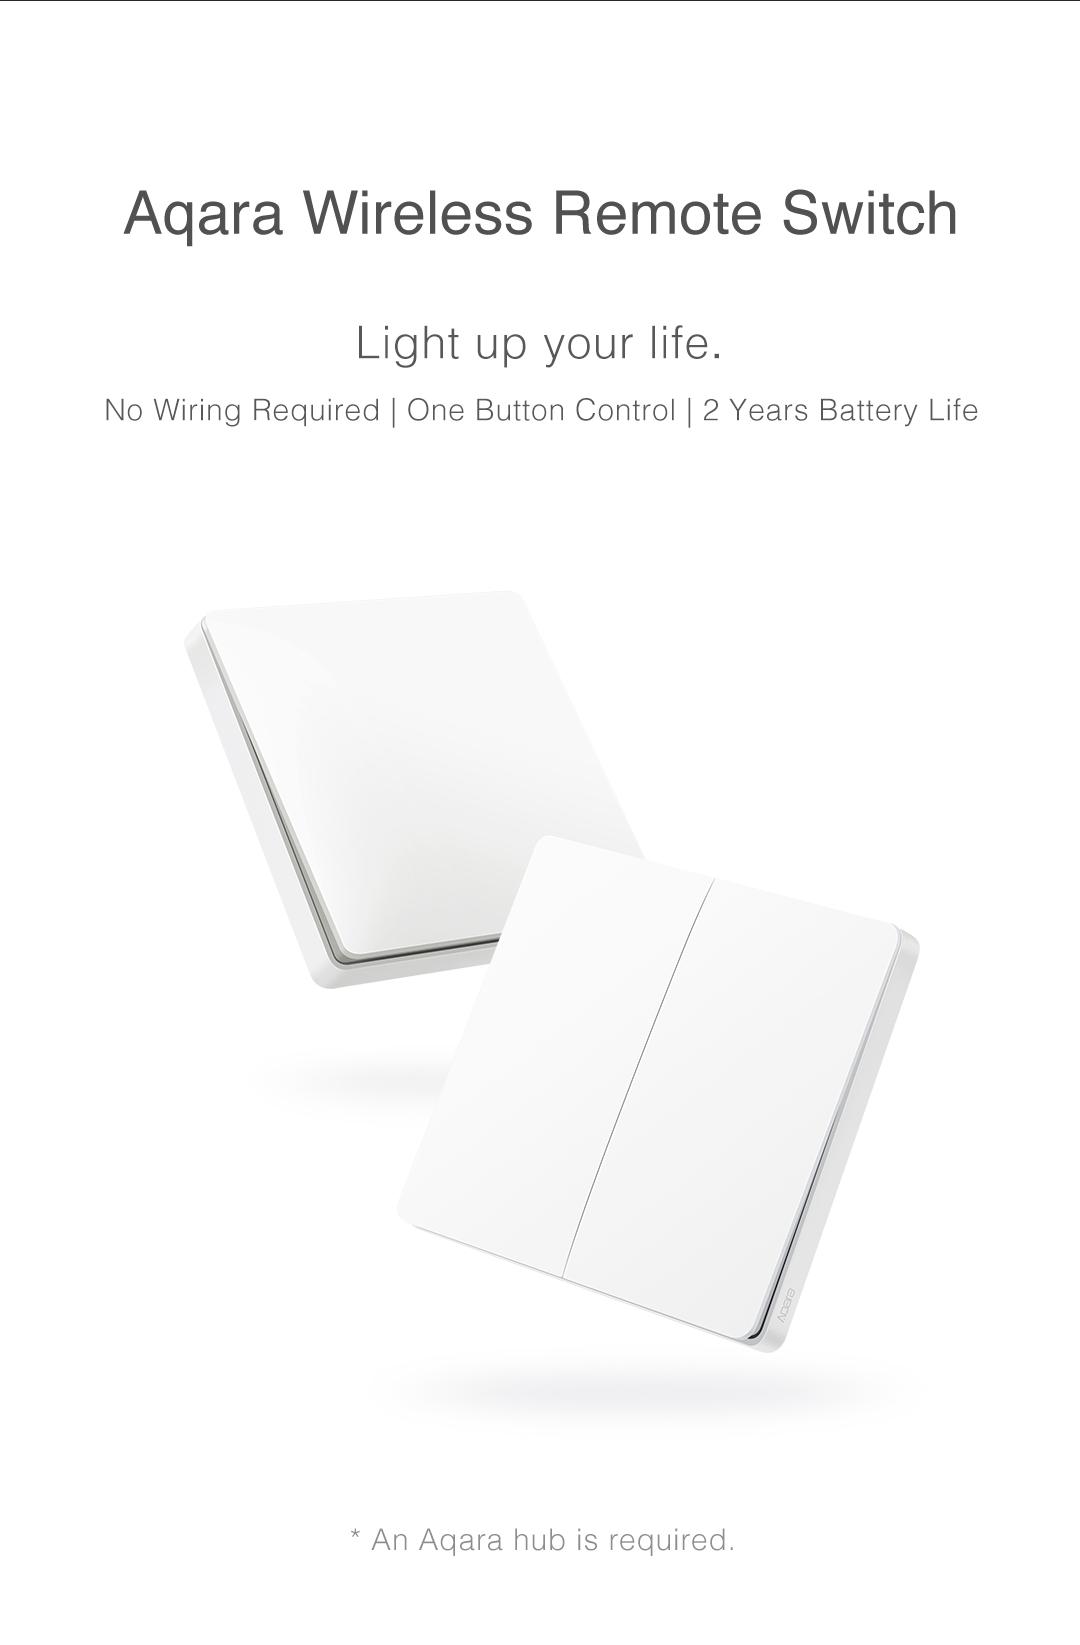 Wireless Remote Light Switch - Smart light switch